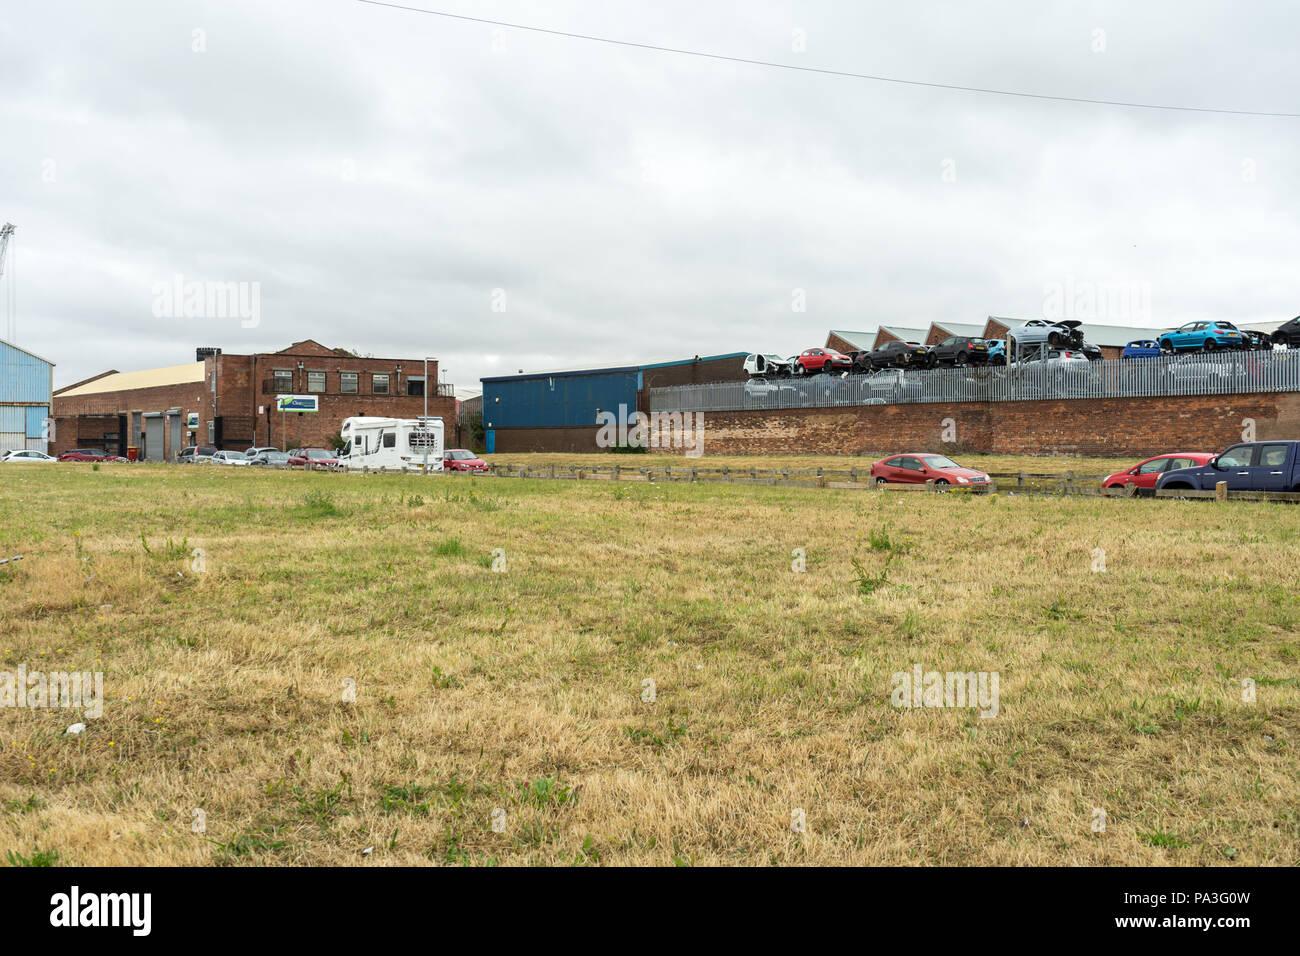 Industrial area in Birkenhead, Wirral, showing a car scrap yard - Stock Image